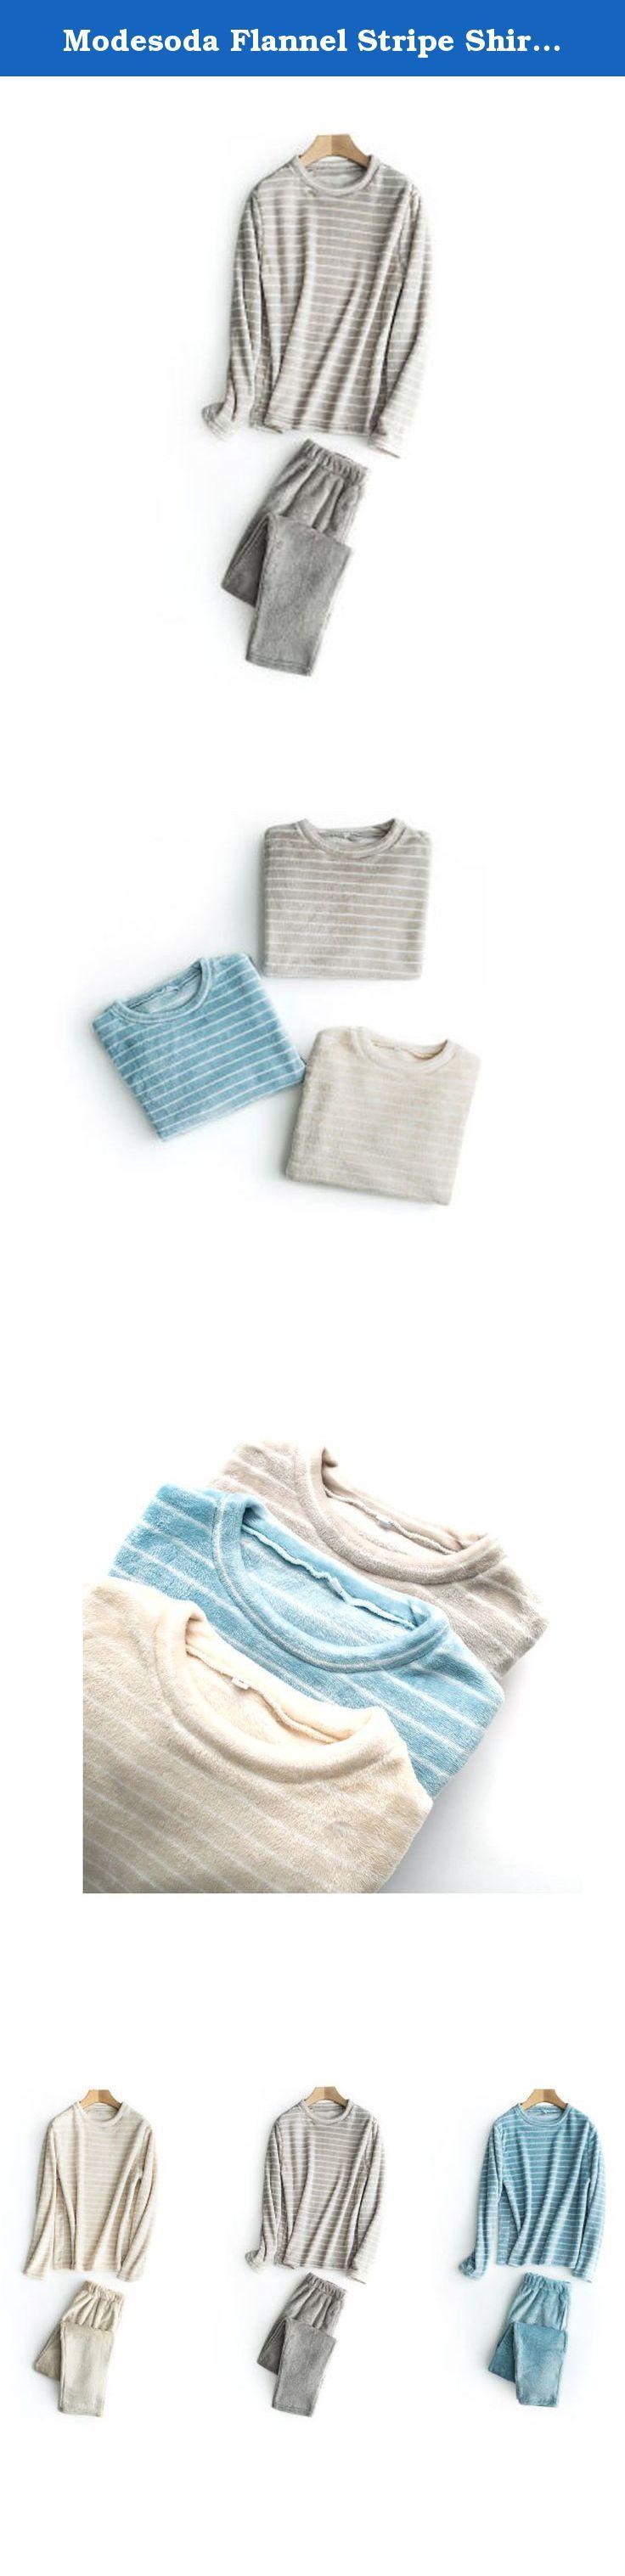 "Modesoda Flannel Stripe Shirt Thermal Pajamas Set Nightdress. Size Chart for Women: S: bust 37"",waist 26-38"",hip 43"",top length 25"",pants length 38"" M: bust 39"",waist 28-39"",hip 44"",top length 26"",pants length 39"" Size Chart for Men: S: bust 37"",waist 26-38"",hip 43"",top length 25"",pants length 38"" M: bust 43"",waist 29-39"",hip 48"",top length 27"",pants length 40""."